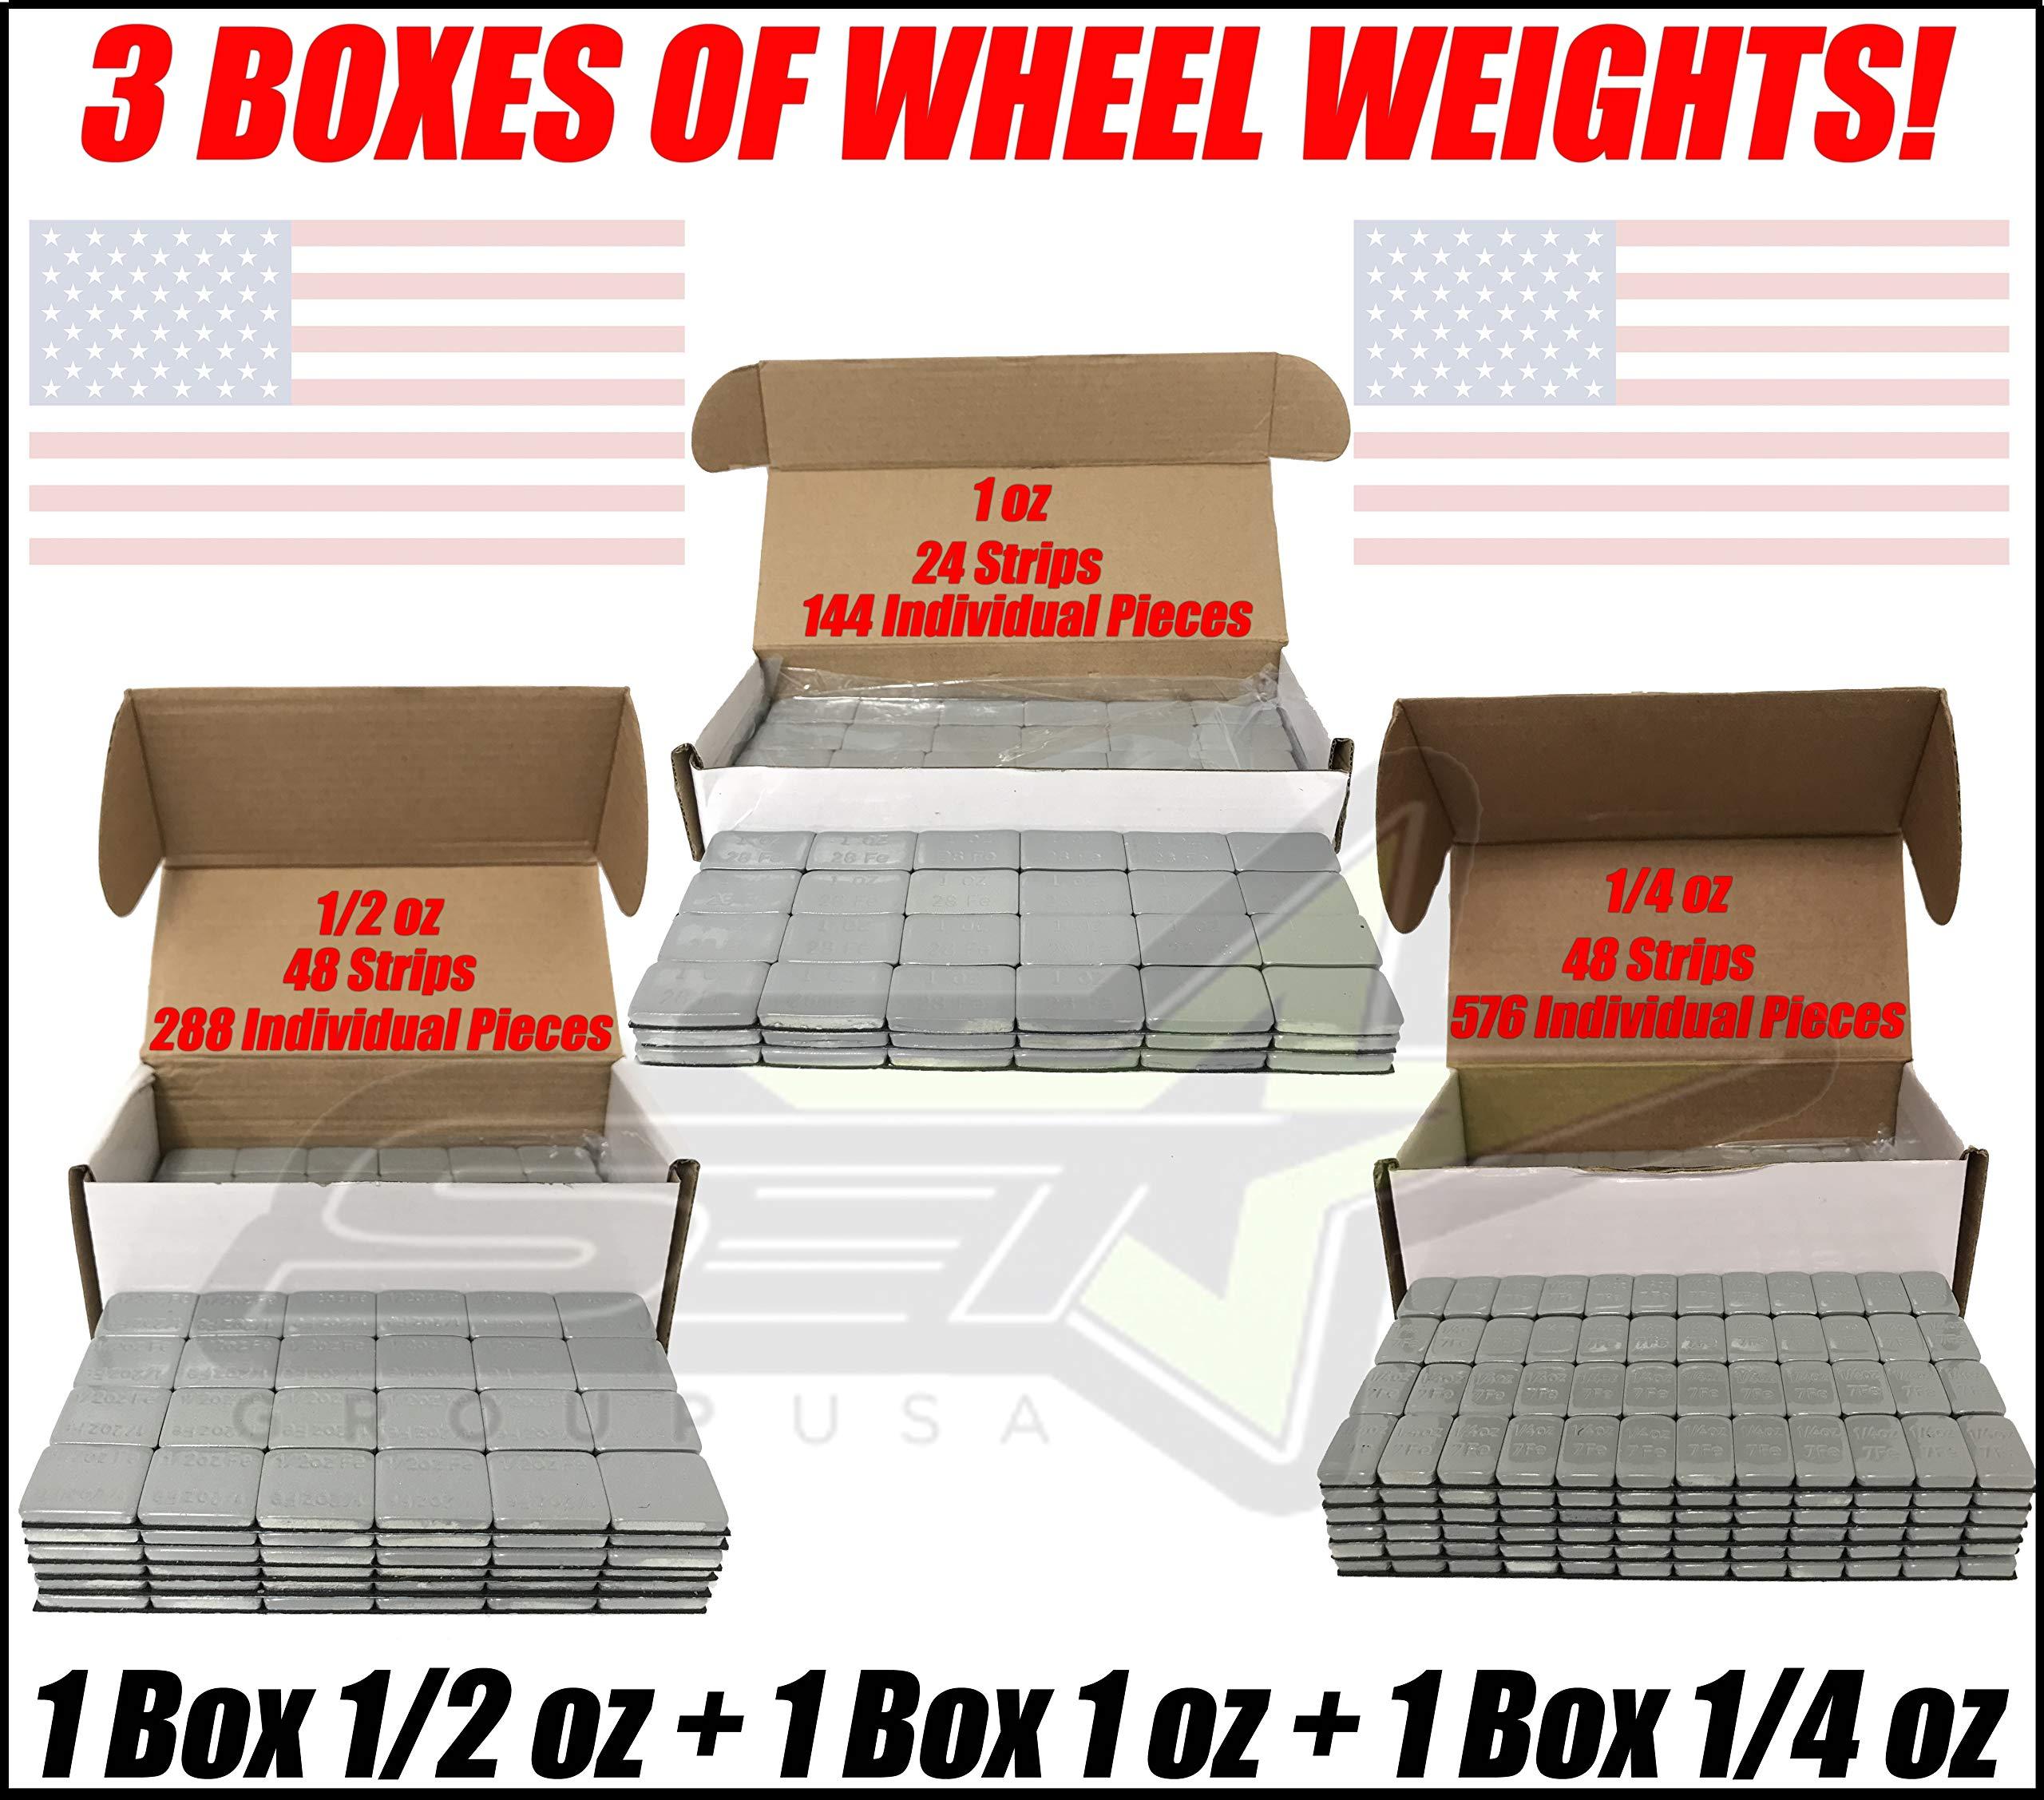 SET Group USA 3 Boxes of Wheel Weights 1/4oz + 1/2oz + 1oz Stick-On Adhesive Tape Total 27 LB (432oz) by SET Group USA